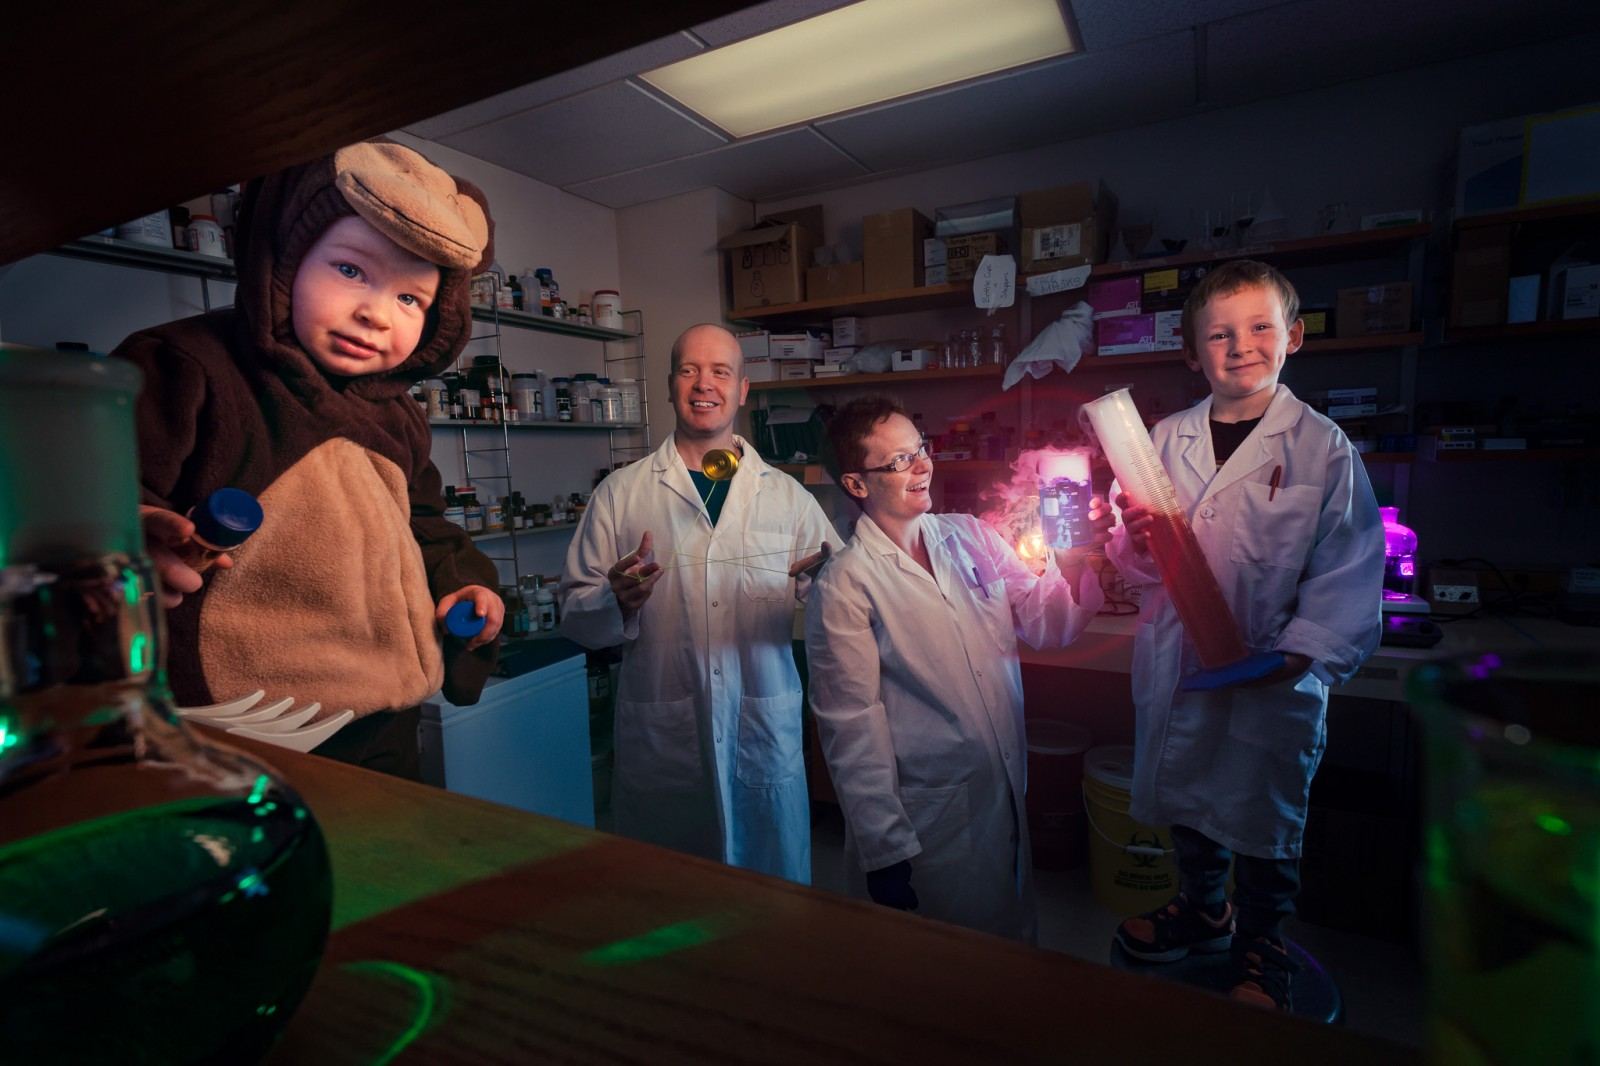 Ottawa_Extreme_Family_Portrait_Photographer_Justin_Van_Leeuwen--Pettit-9-Edit